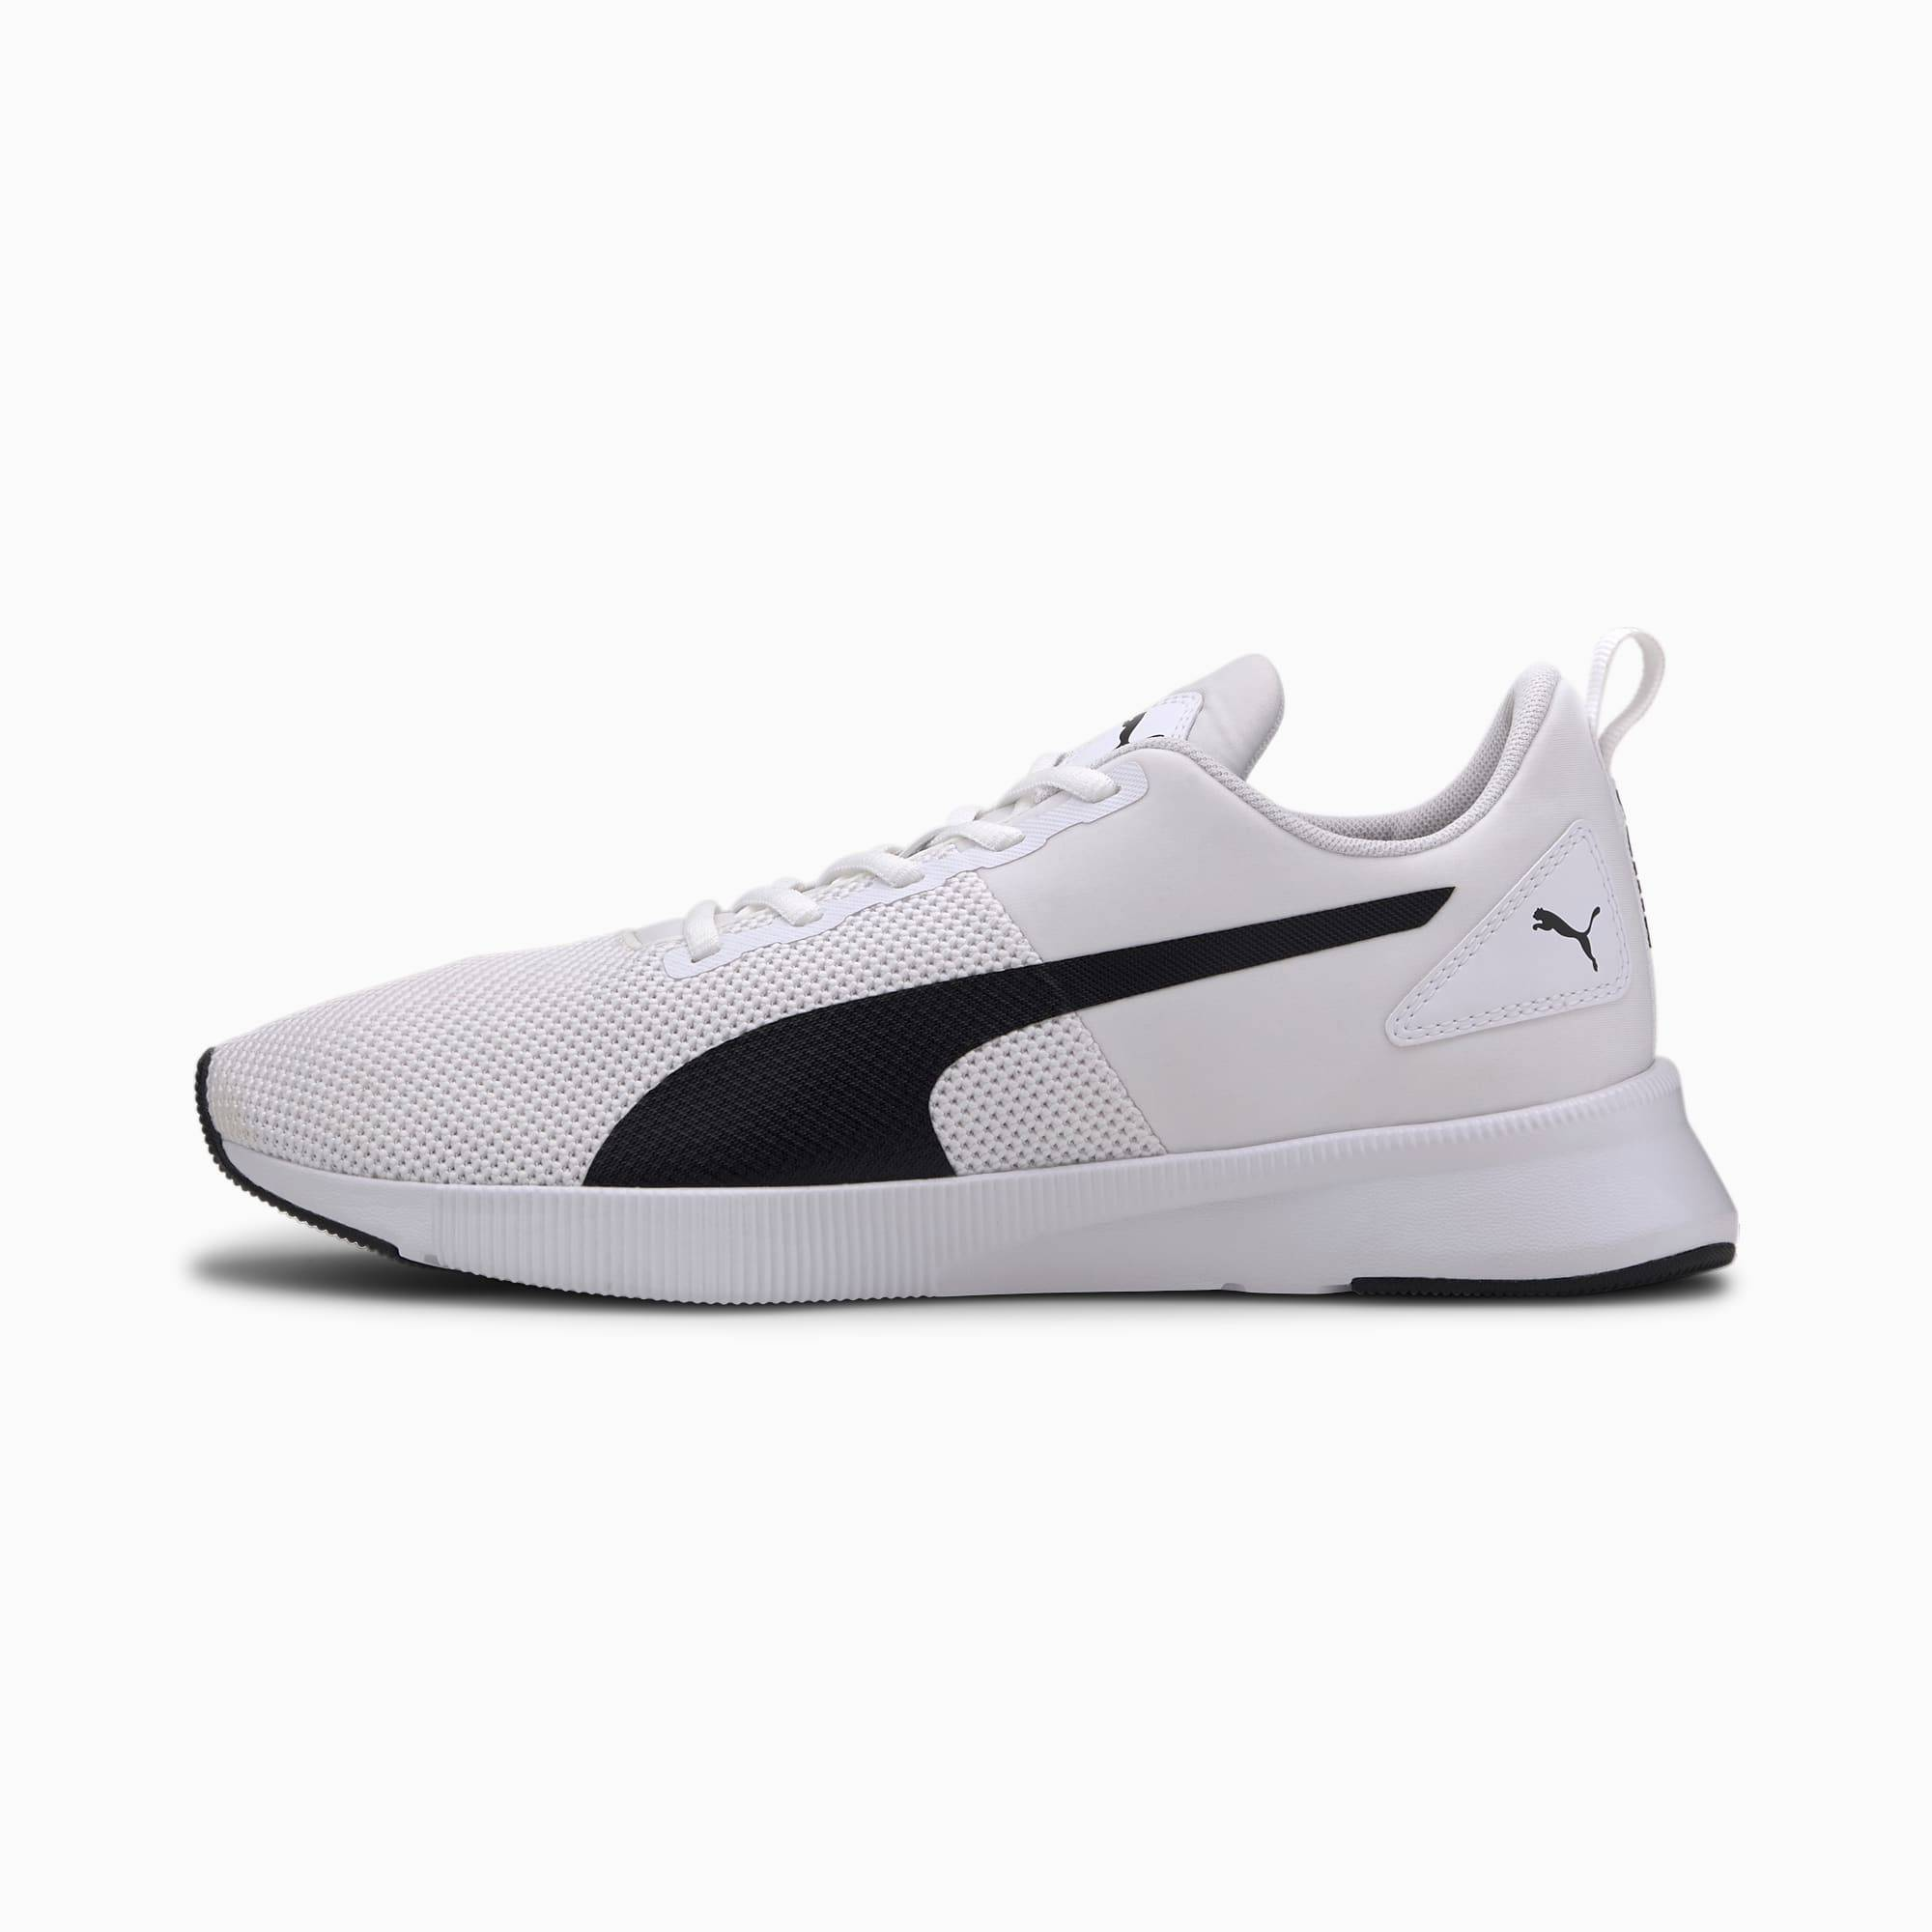 PUMA Chaussure de course Flyer Runner, Blanc/Noir, Taille 38.5, Chaussures